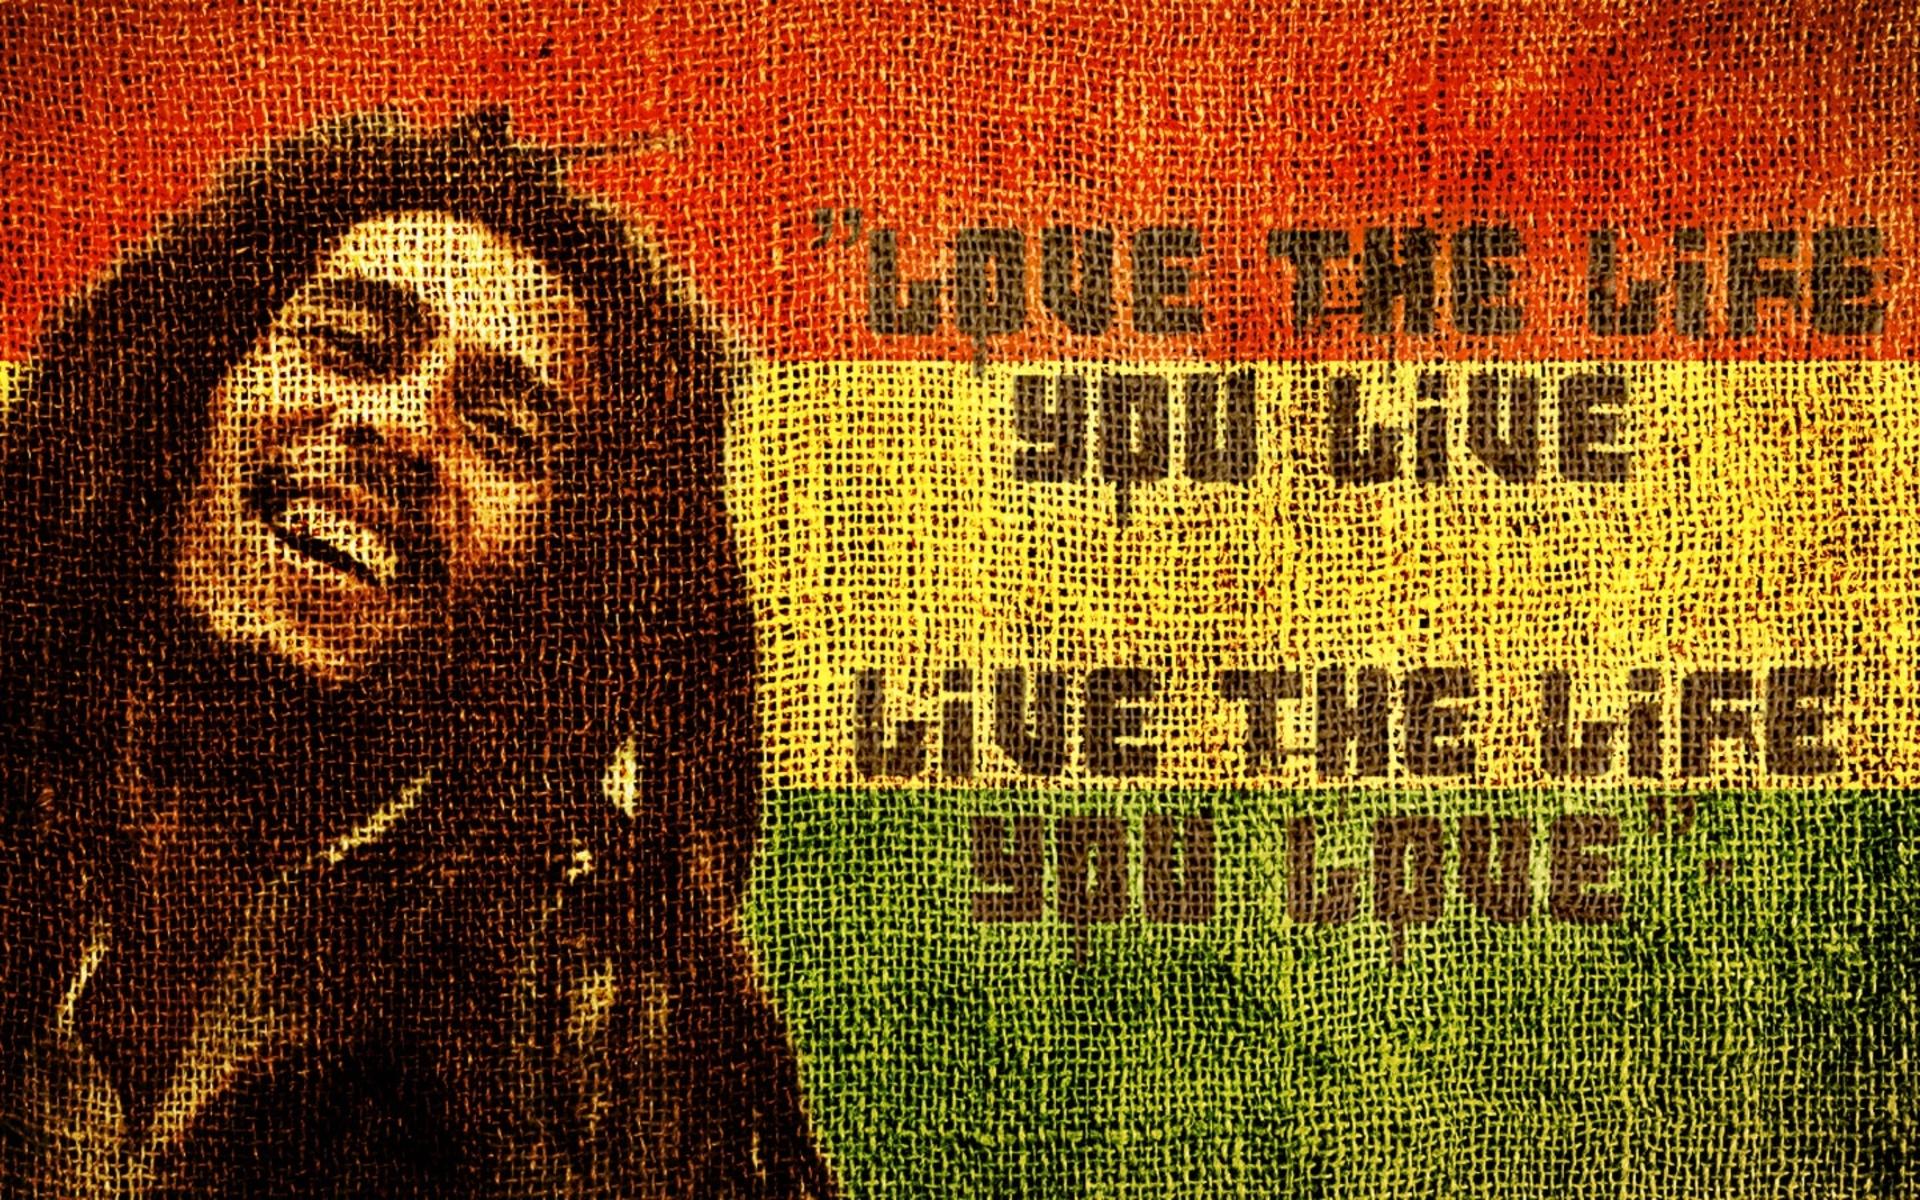 Bob Marley Love The Life You Live 3248 Wallpaper - Bob Marley - HD Wallpaper